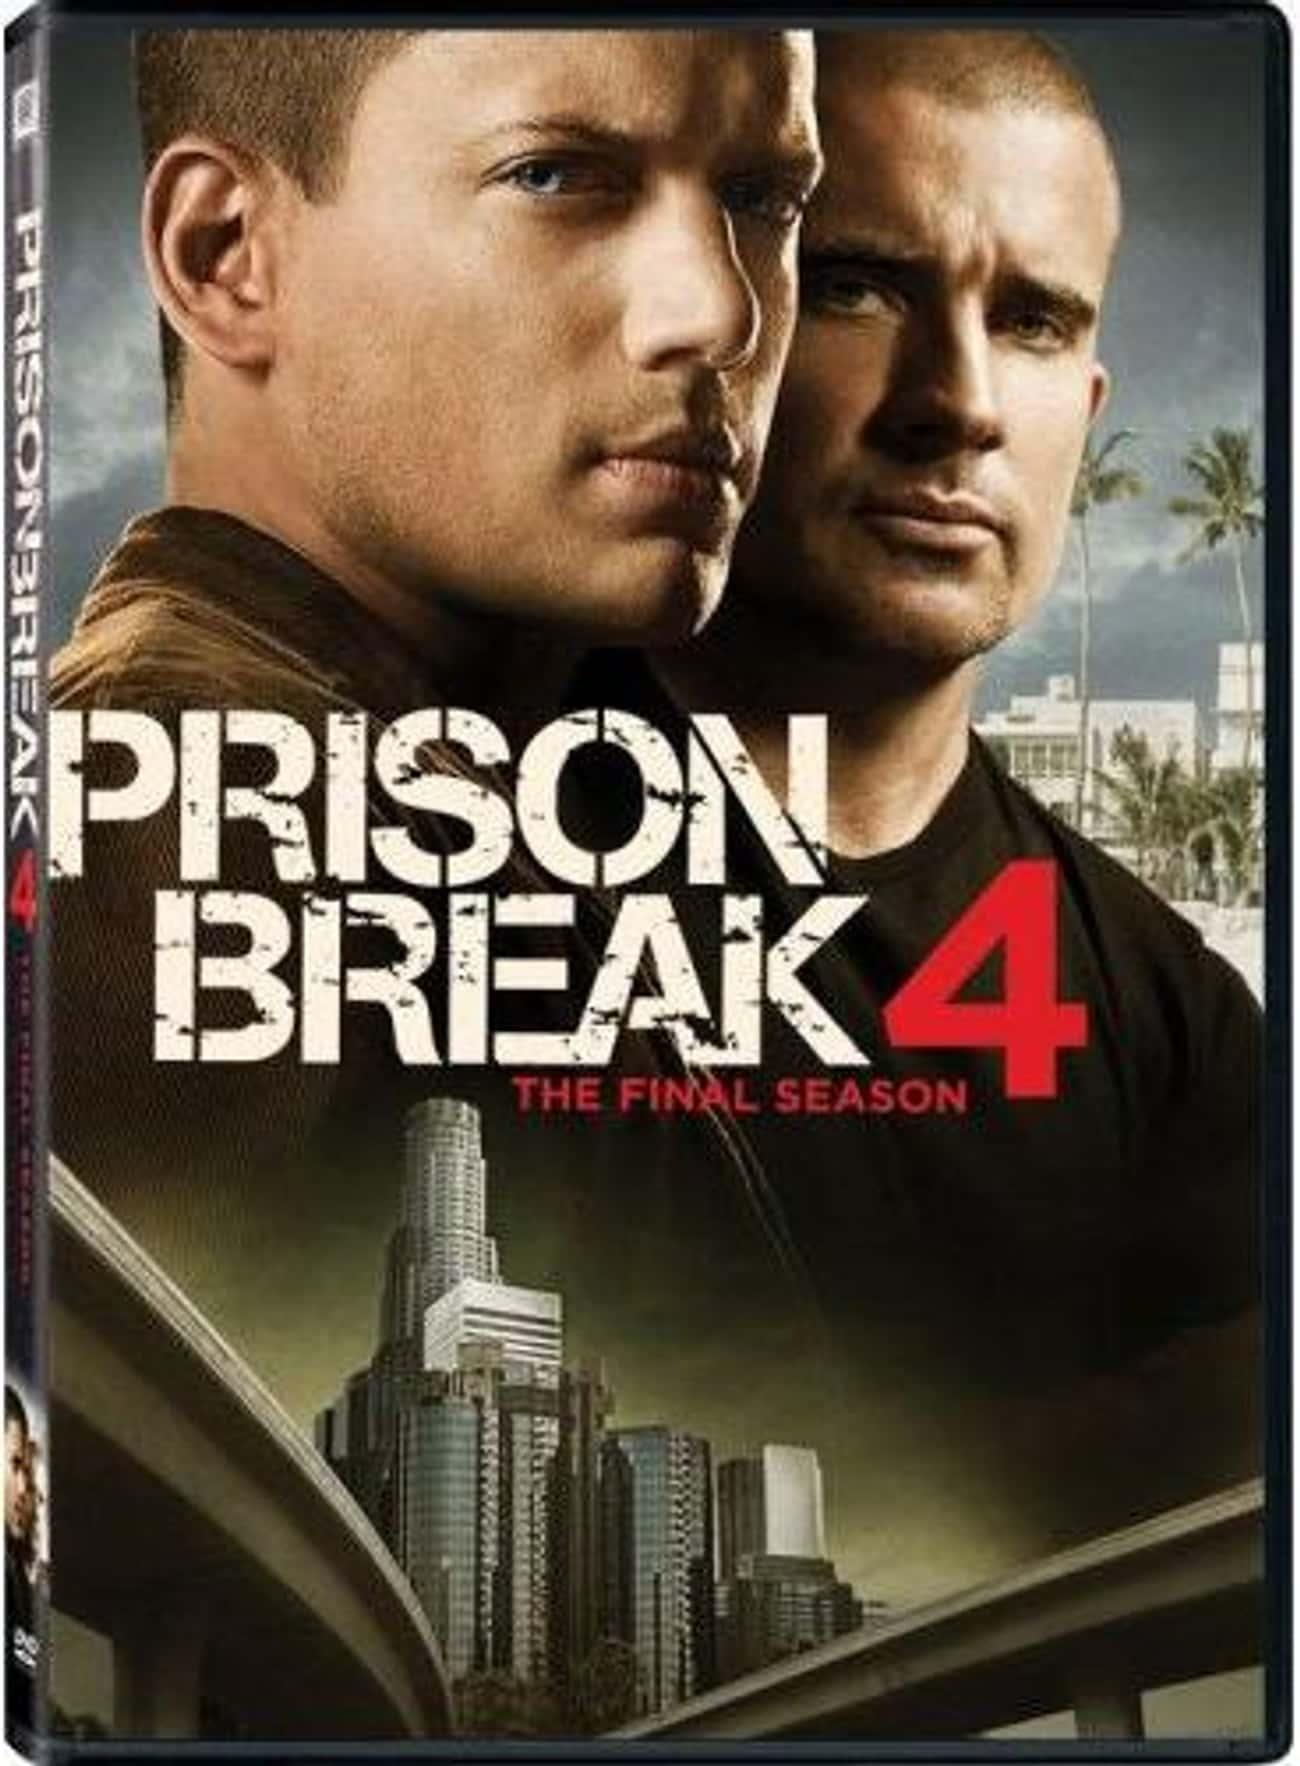 Prison Break - Season 4 is listed (or ranked) 4 on the list The Best Seasons of Prison Break